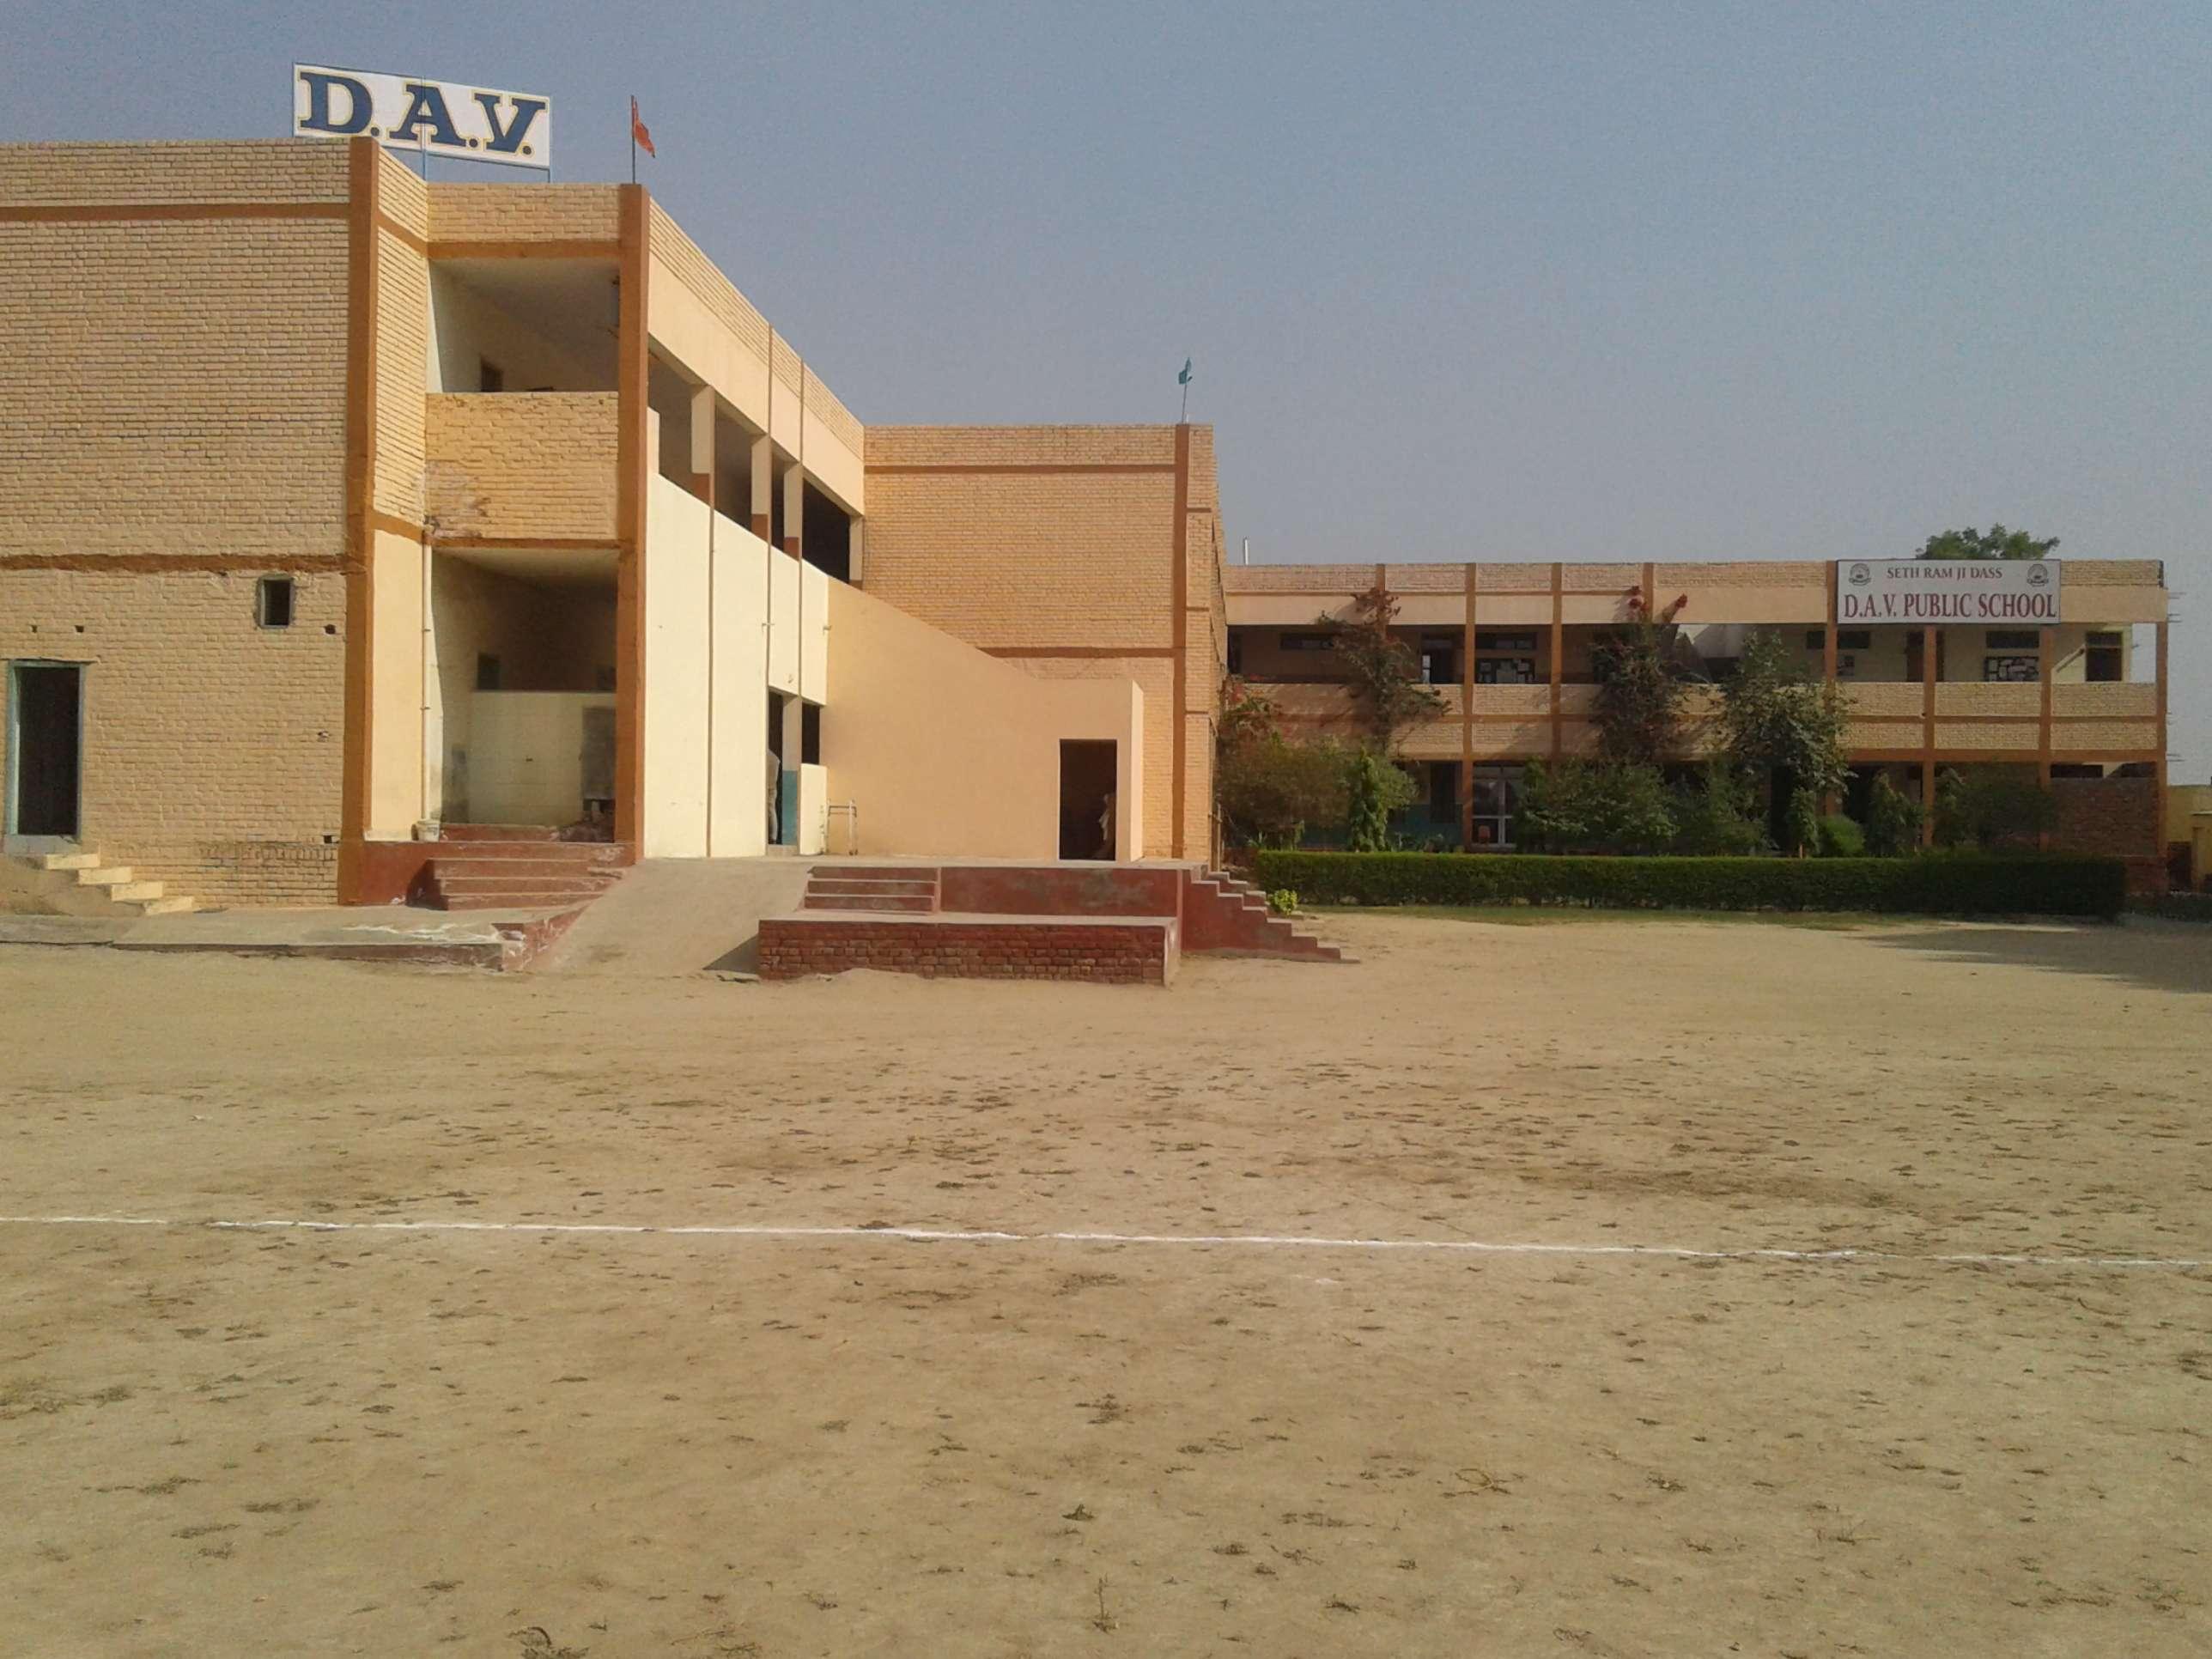 SETH RAMJI DASS DAV CENT PUB SCHOOL RANIA DISTT SIRSA HARYANA 530498